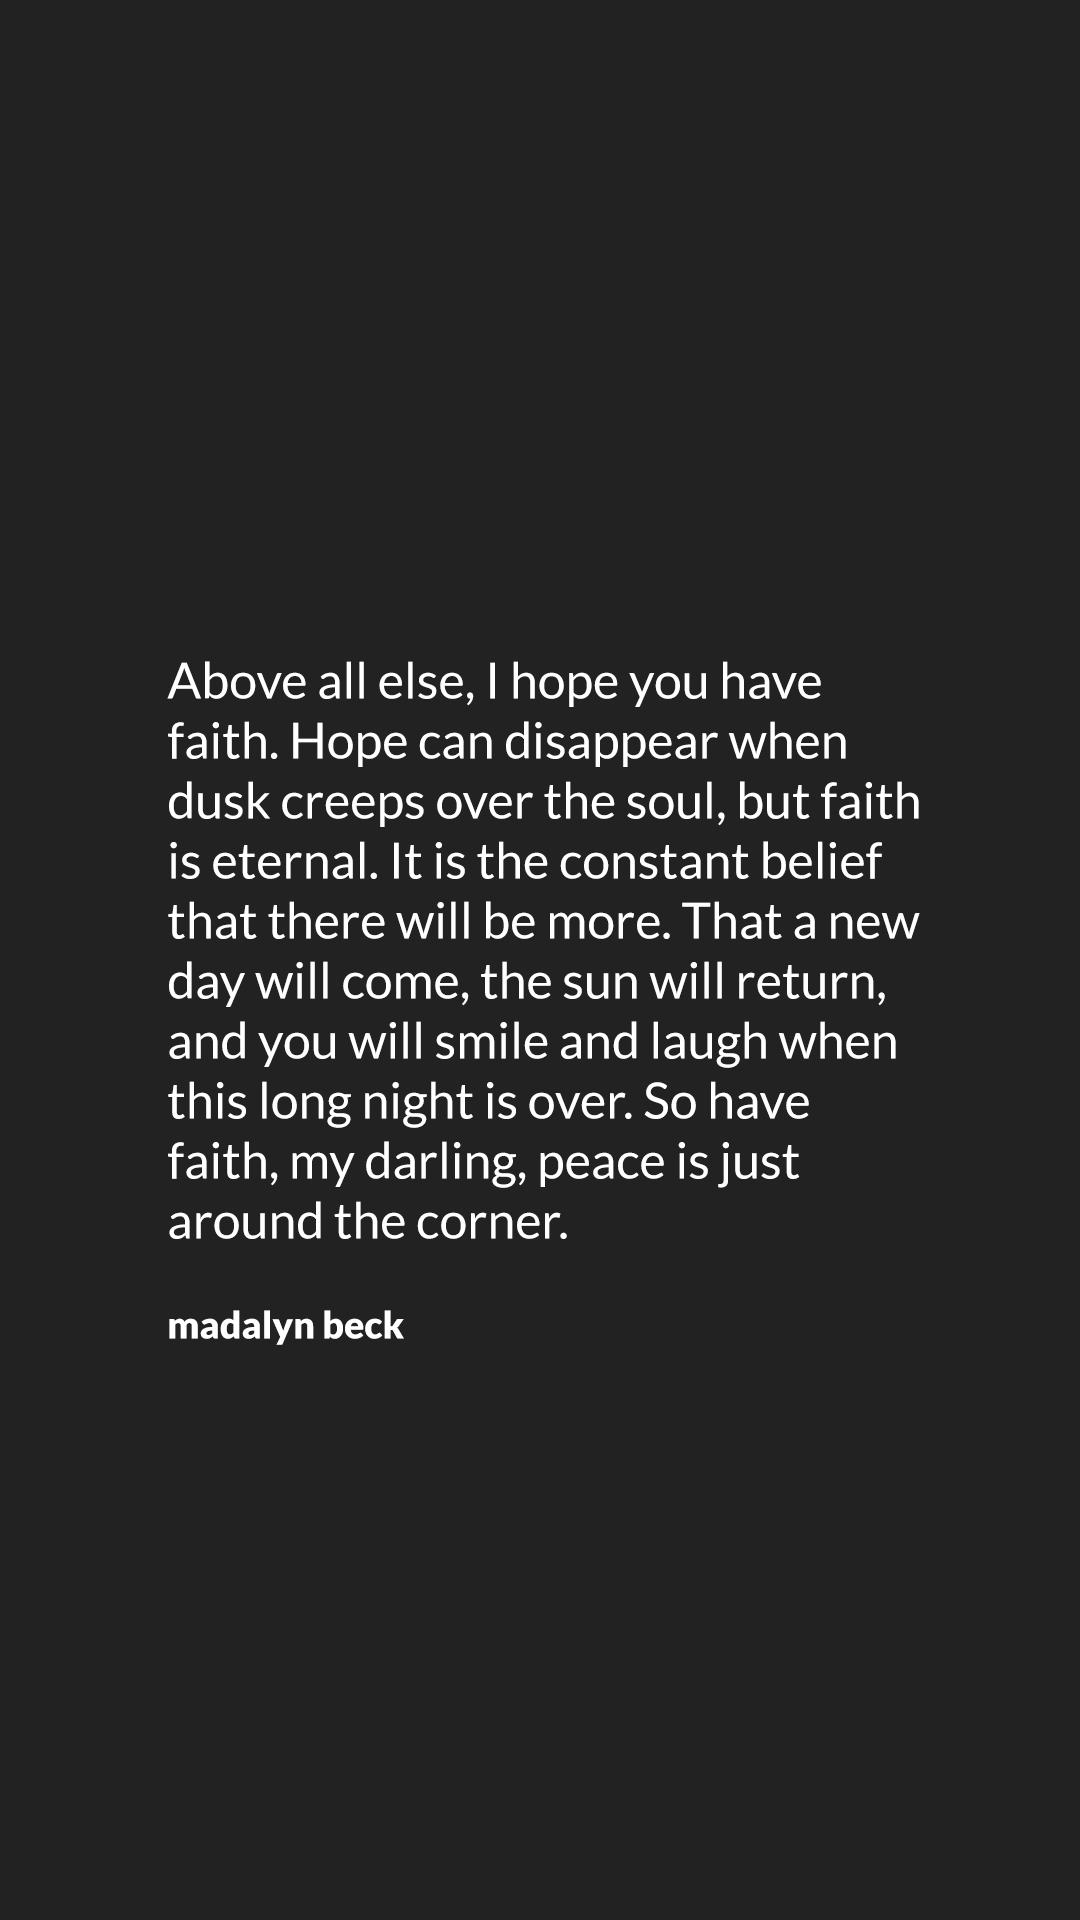 Have Faith By Madalyn Beck Faith Quotes Faith Smiles And Laughs